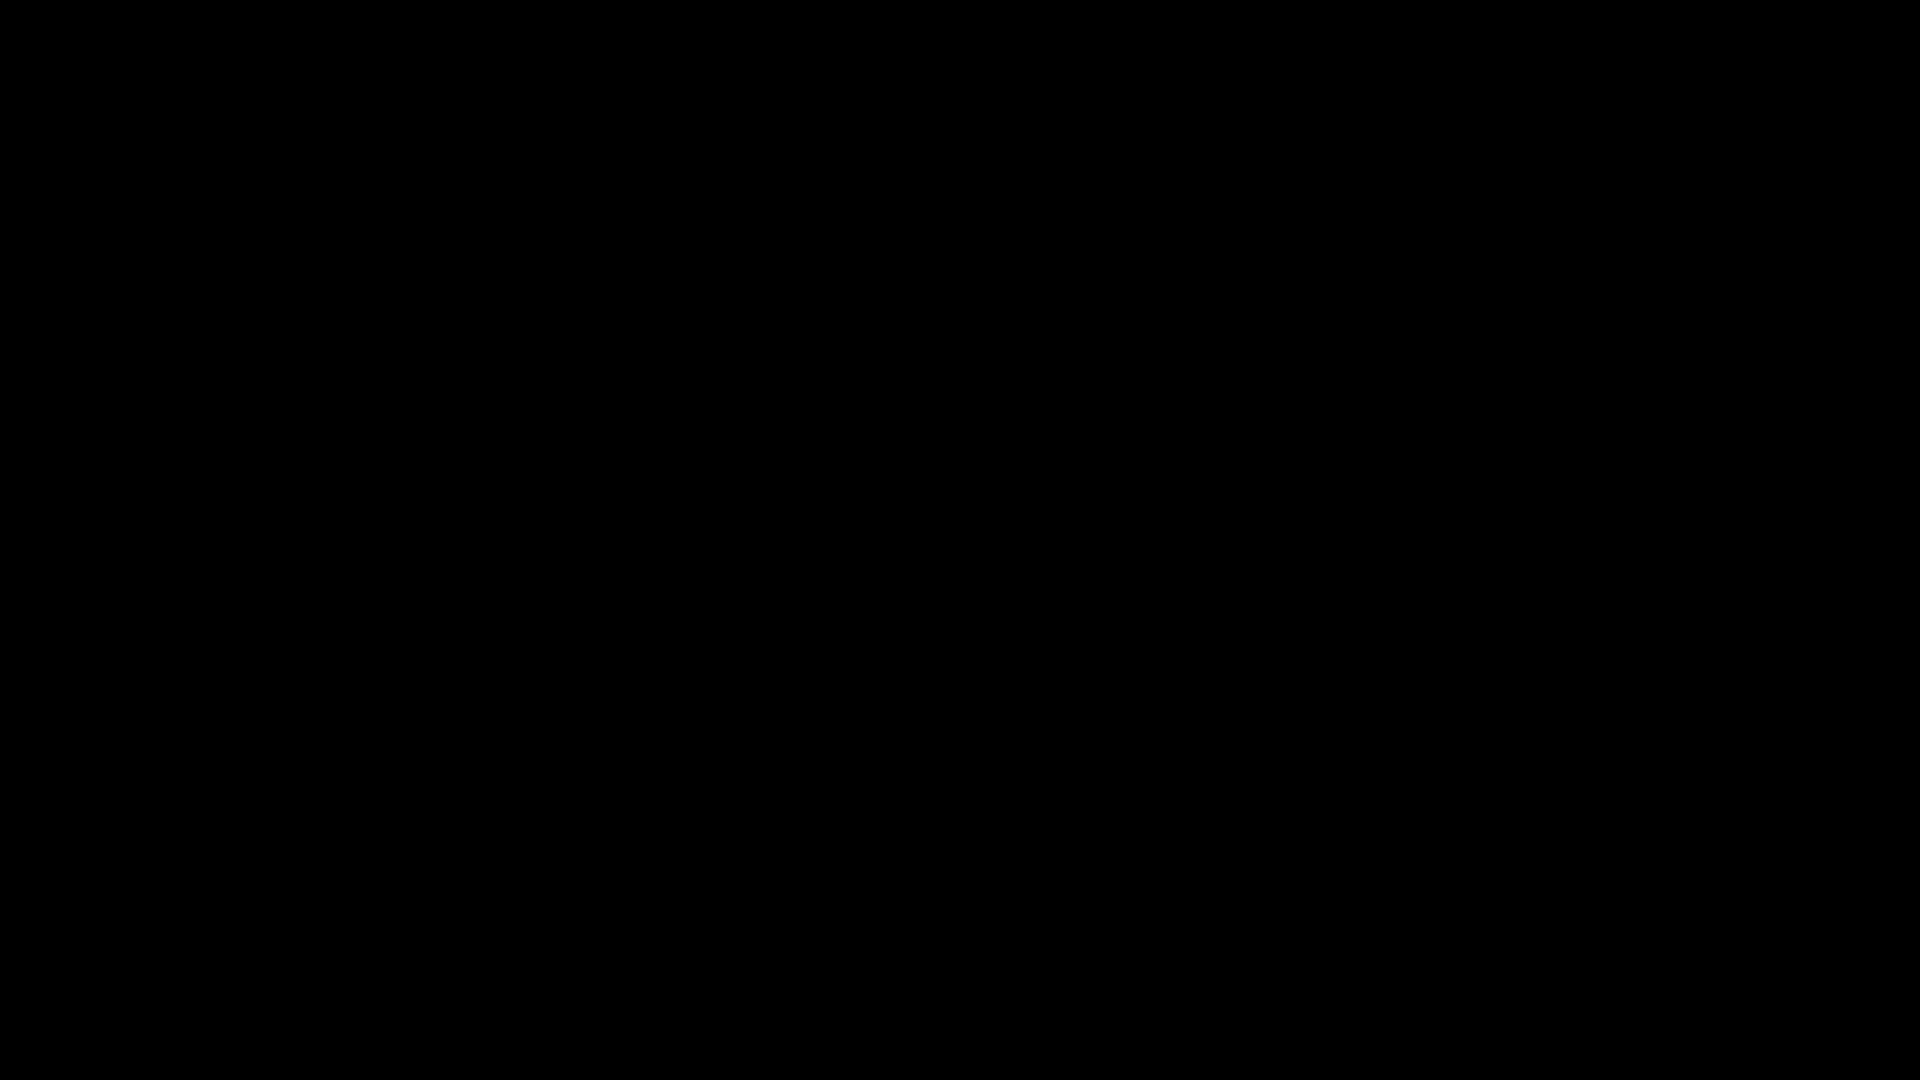 arcane cctv